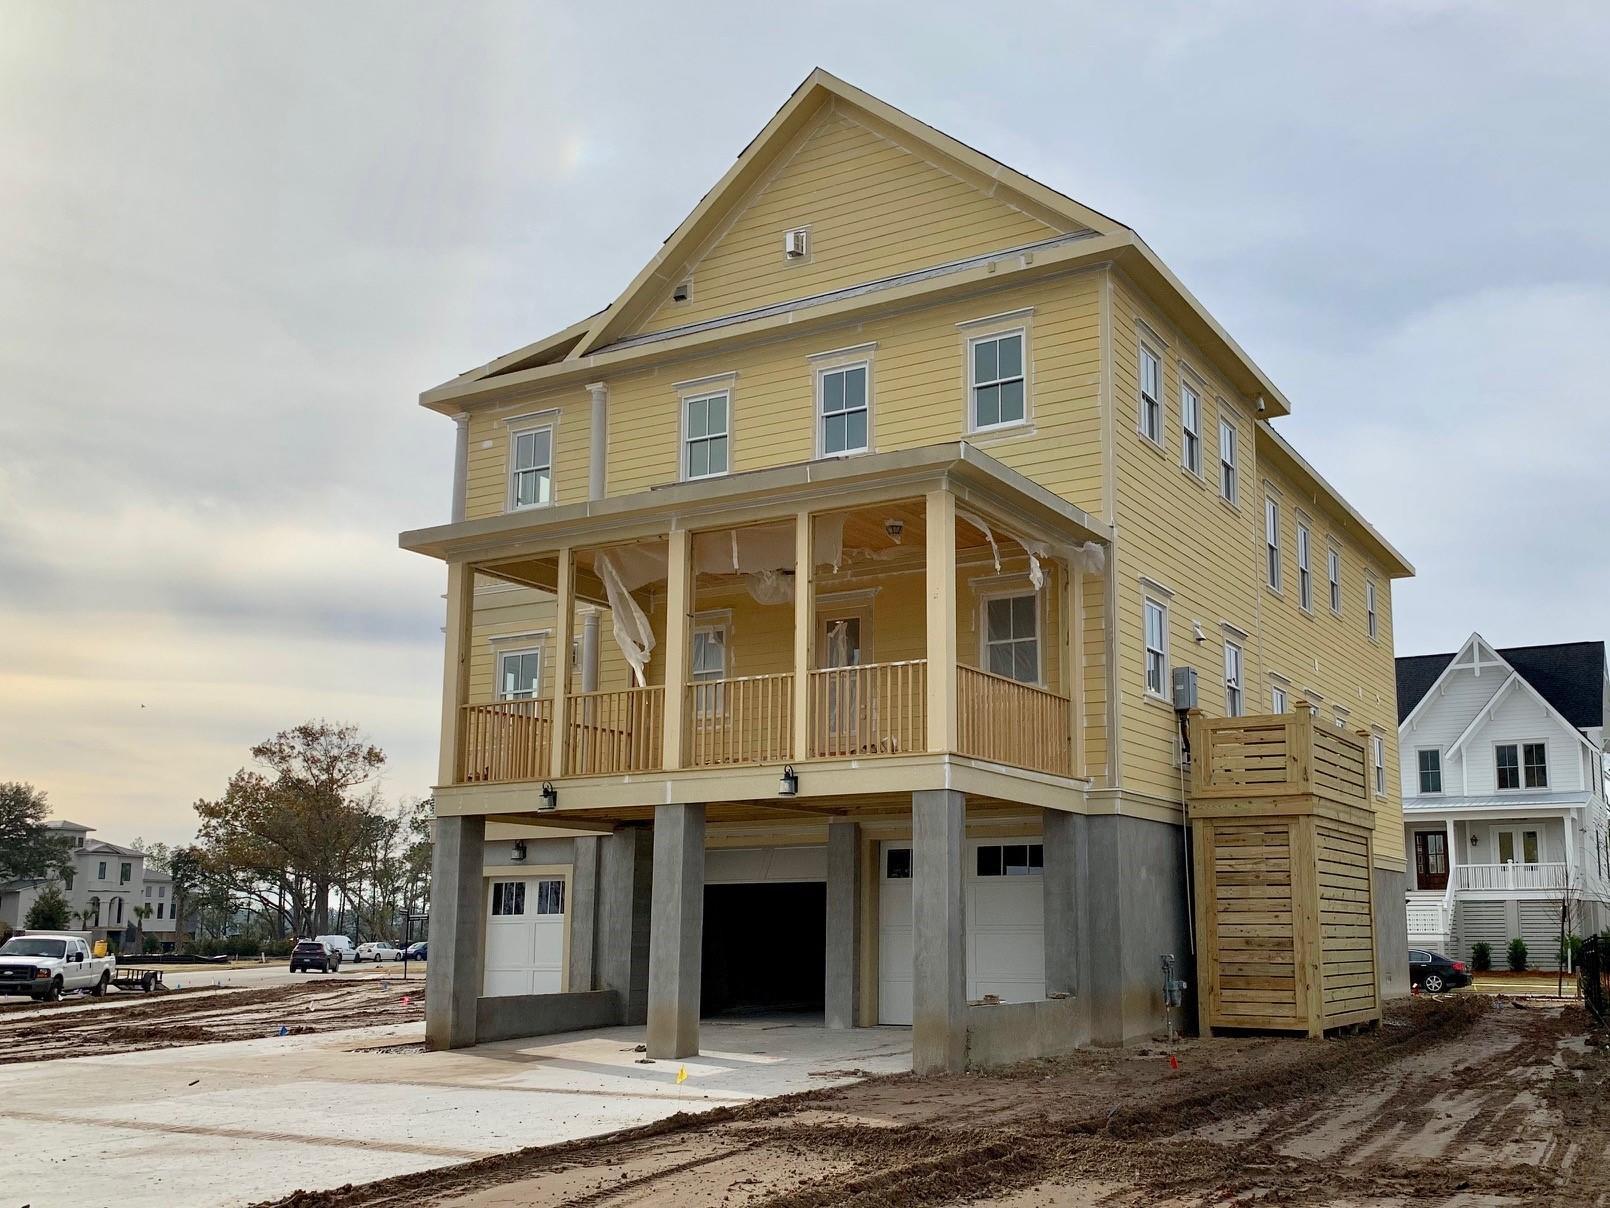 Daniel Island Homes For Sale - 206 Foundry, Charleston, SC - 5